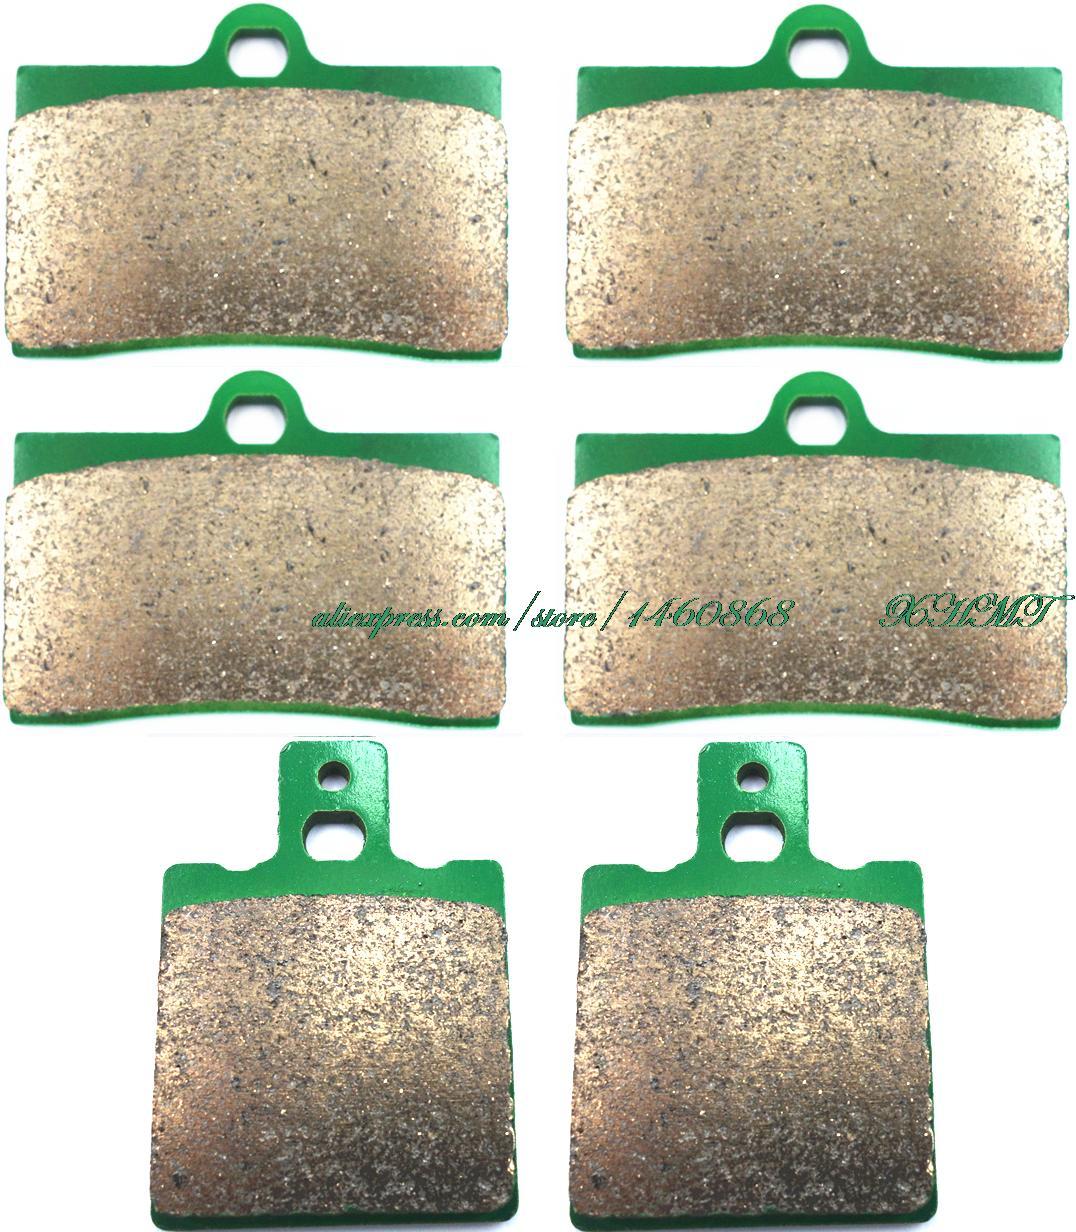 brake-pads-set-for-ducati-916-strada-font-b-senna-b-font-sp-sps-1994-1995-1996-1997-m750-m-750-monster-1996-1997-1998-1999